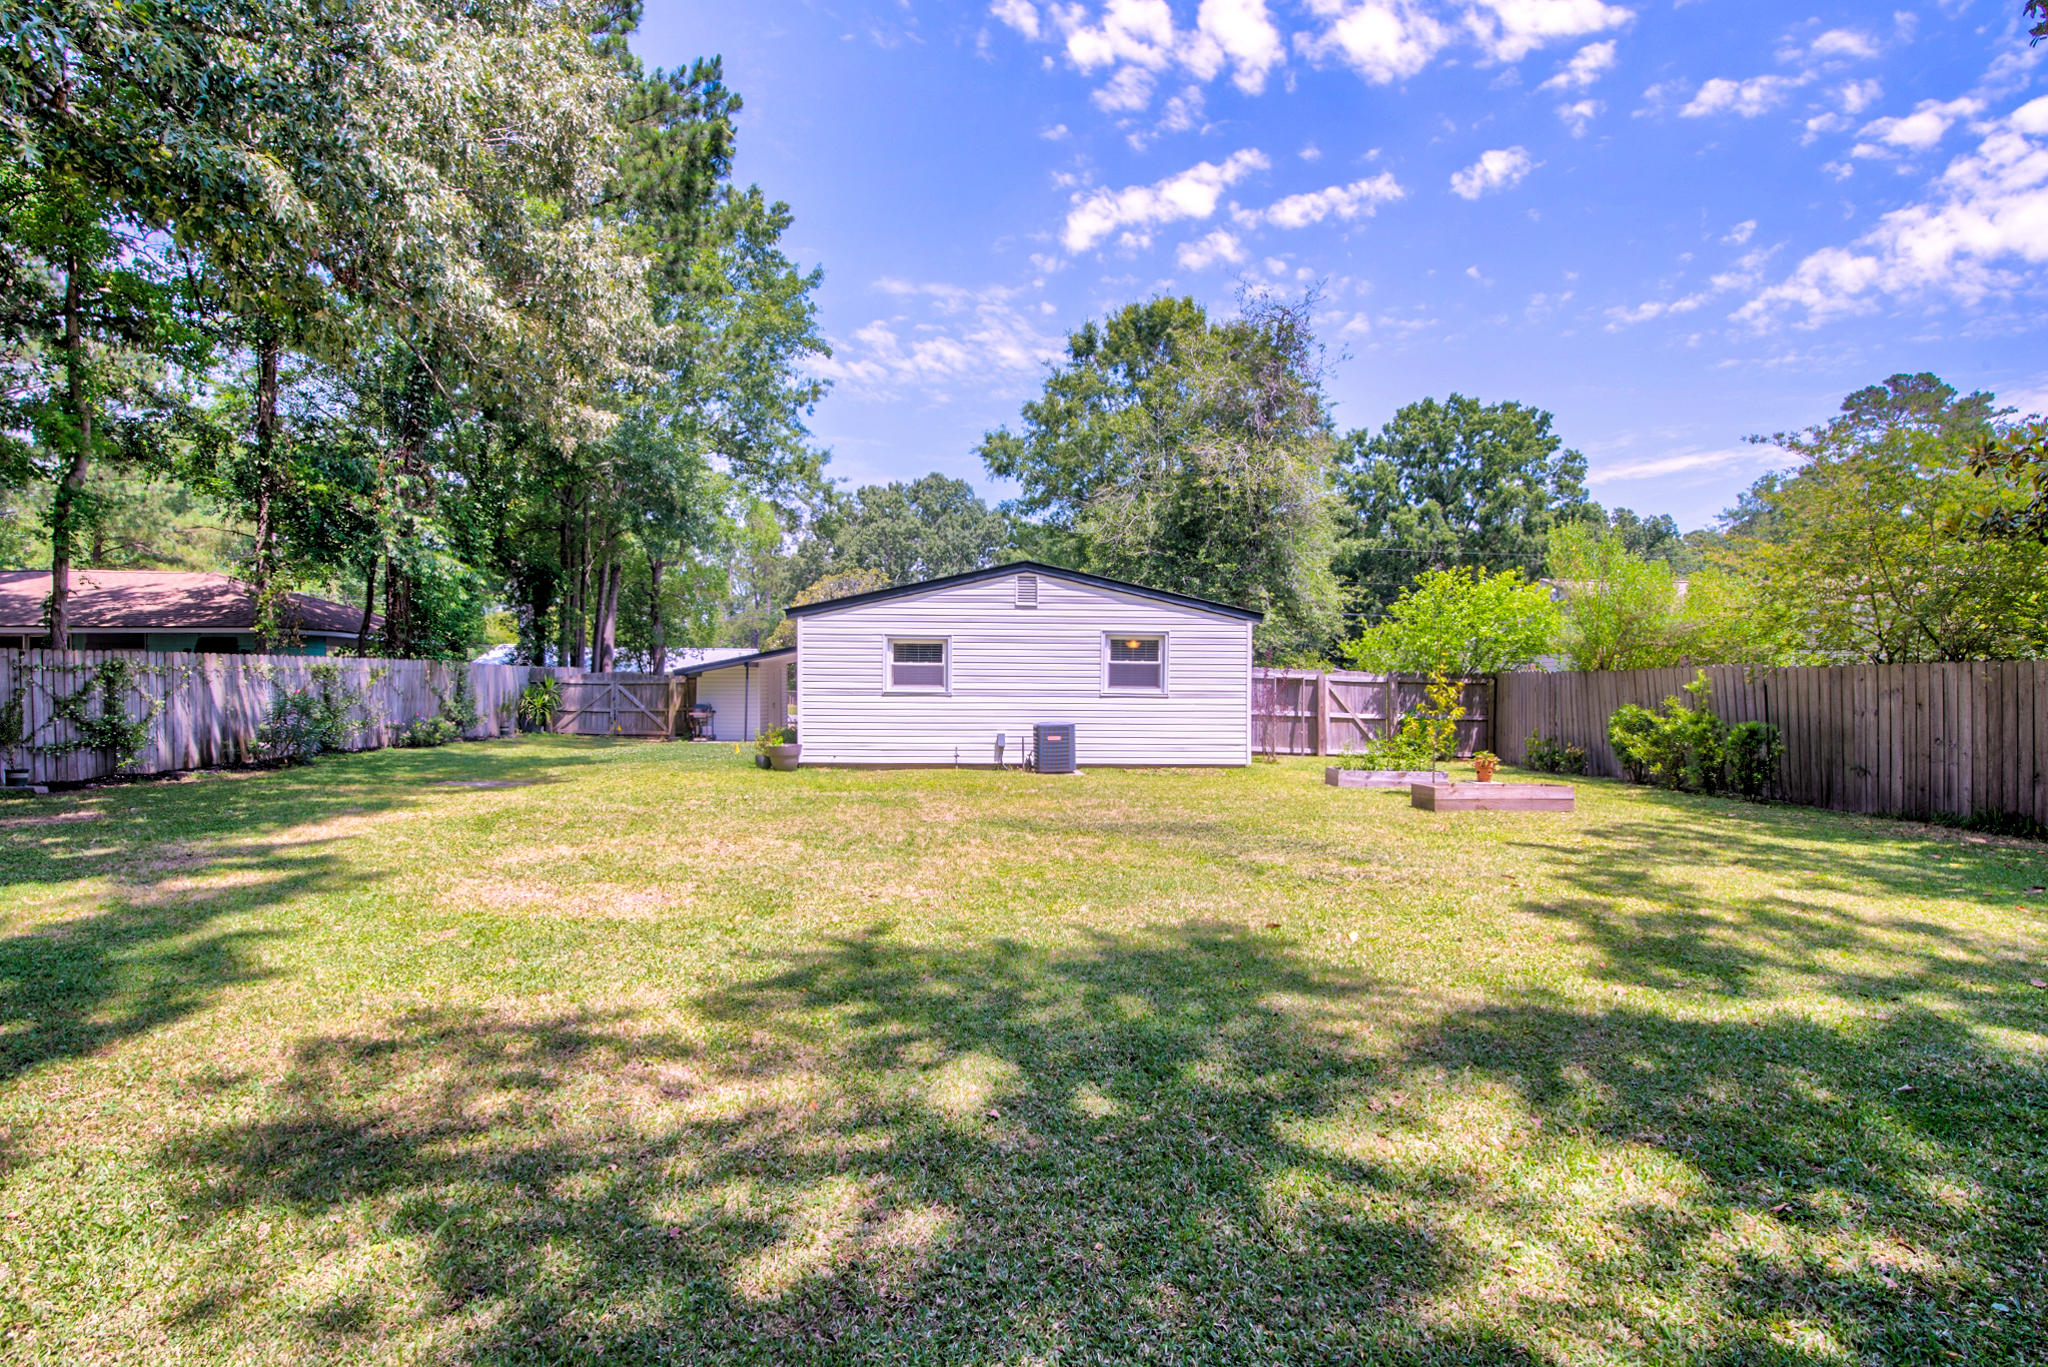 Oakland Homes For Sale - 2131 Clayton, Charleston, SC - 14